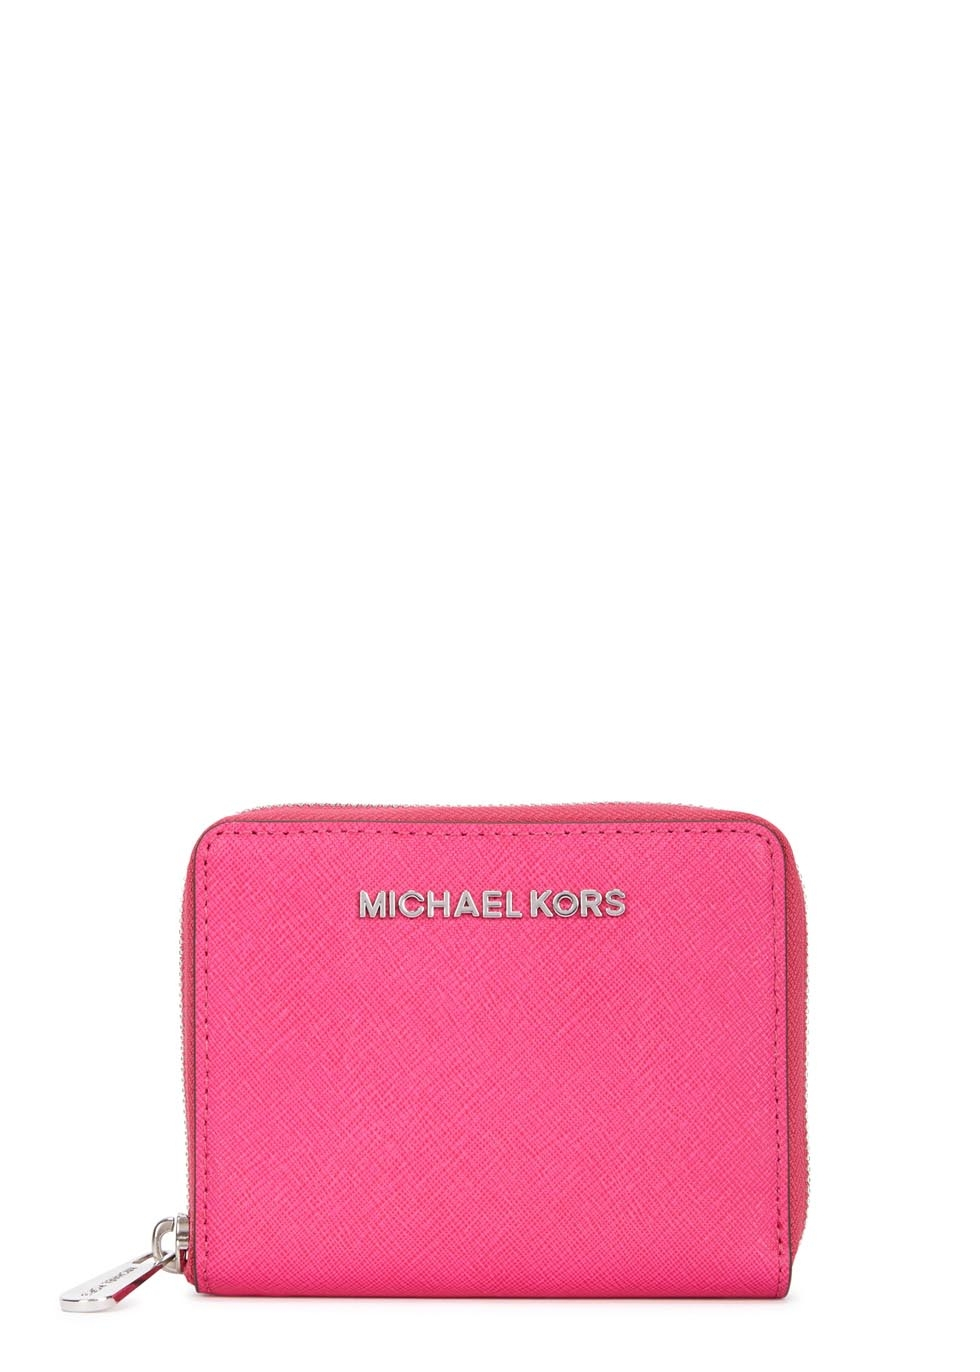 Lyst Michael Kors Jet Set Travel Fuchsia Leather Wallet